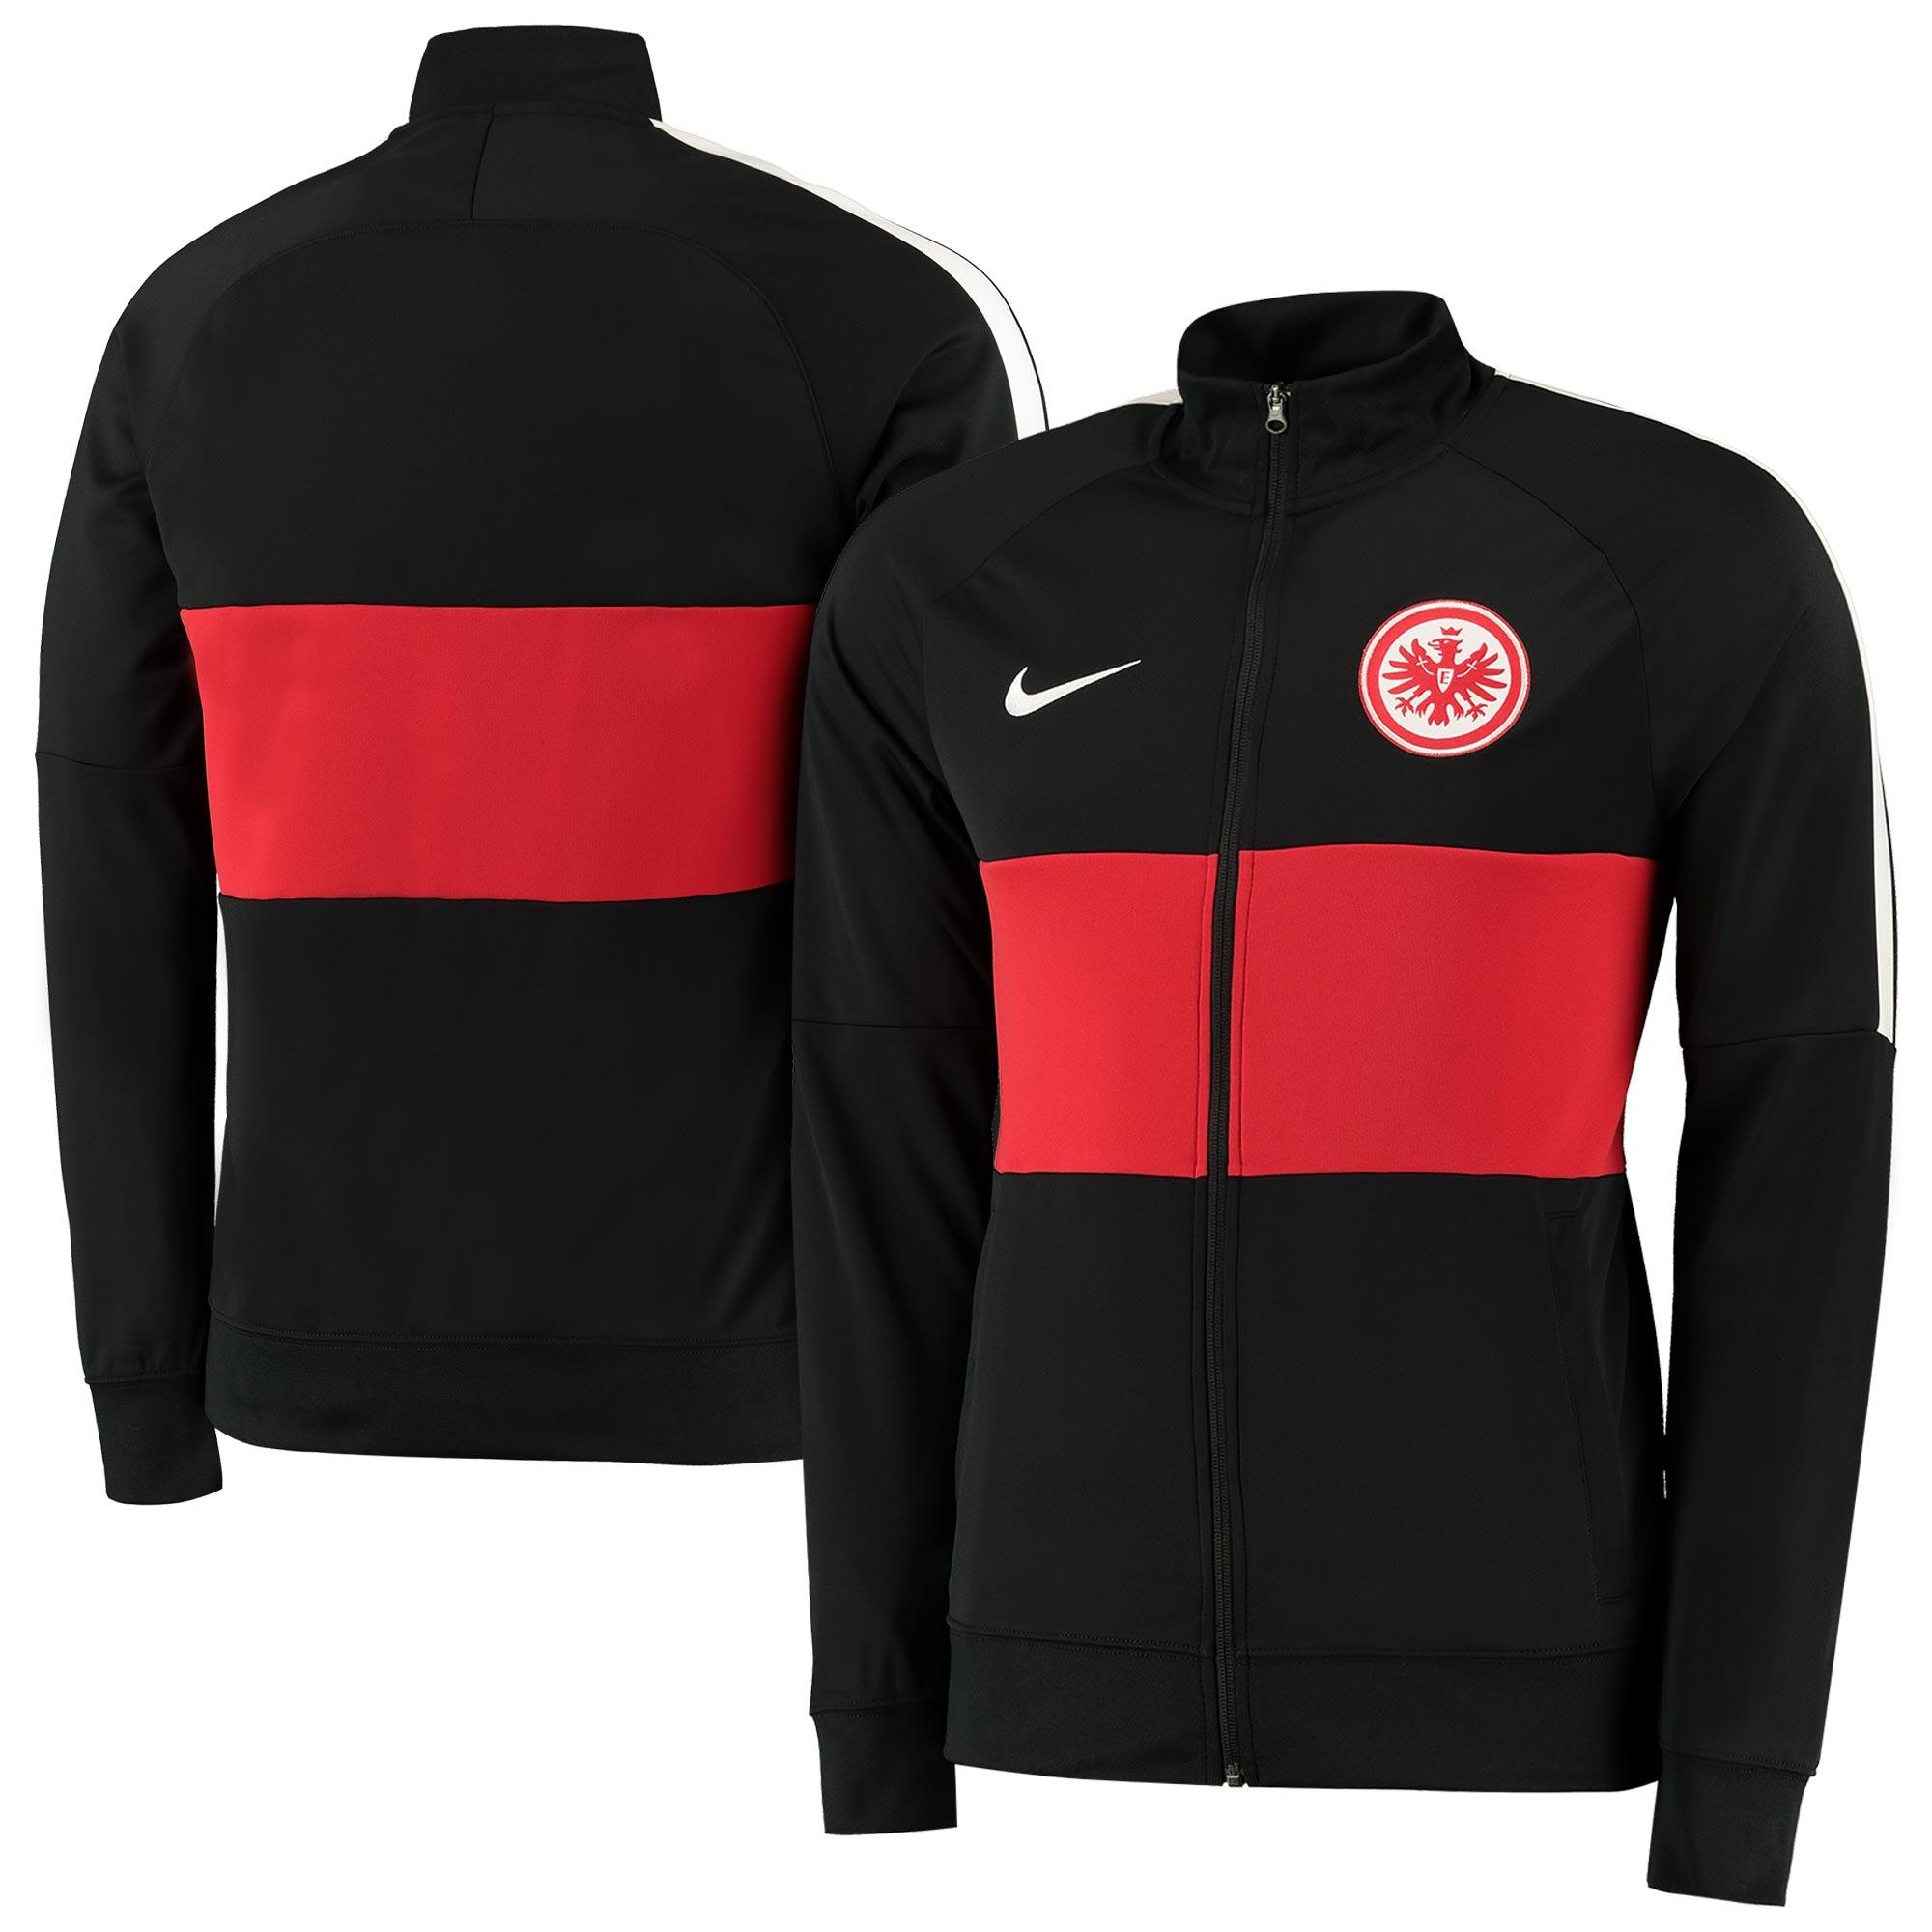 Nike Eintracht Frankfurt Academy Track Jacket Dry BlackRedWhite